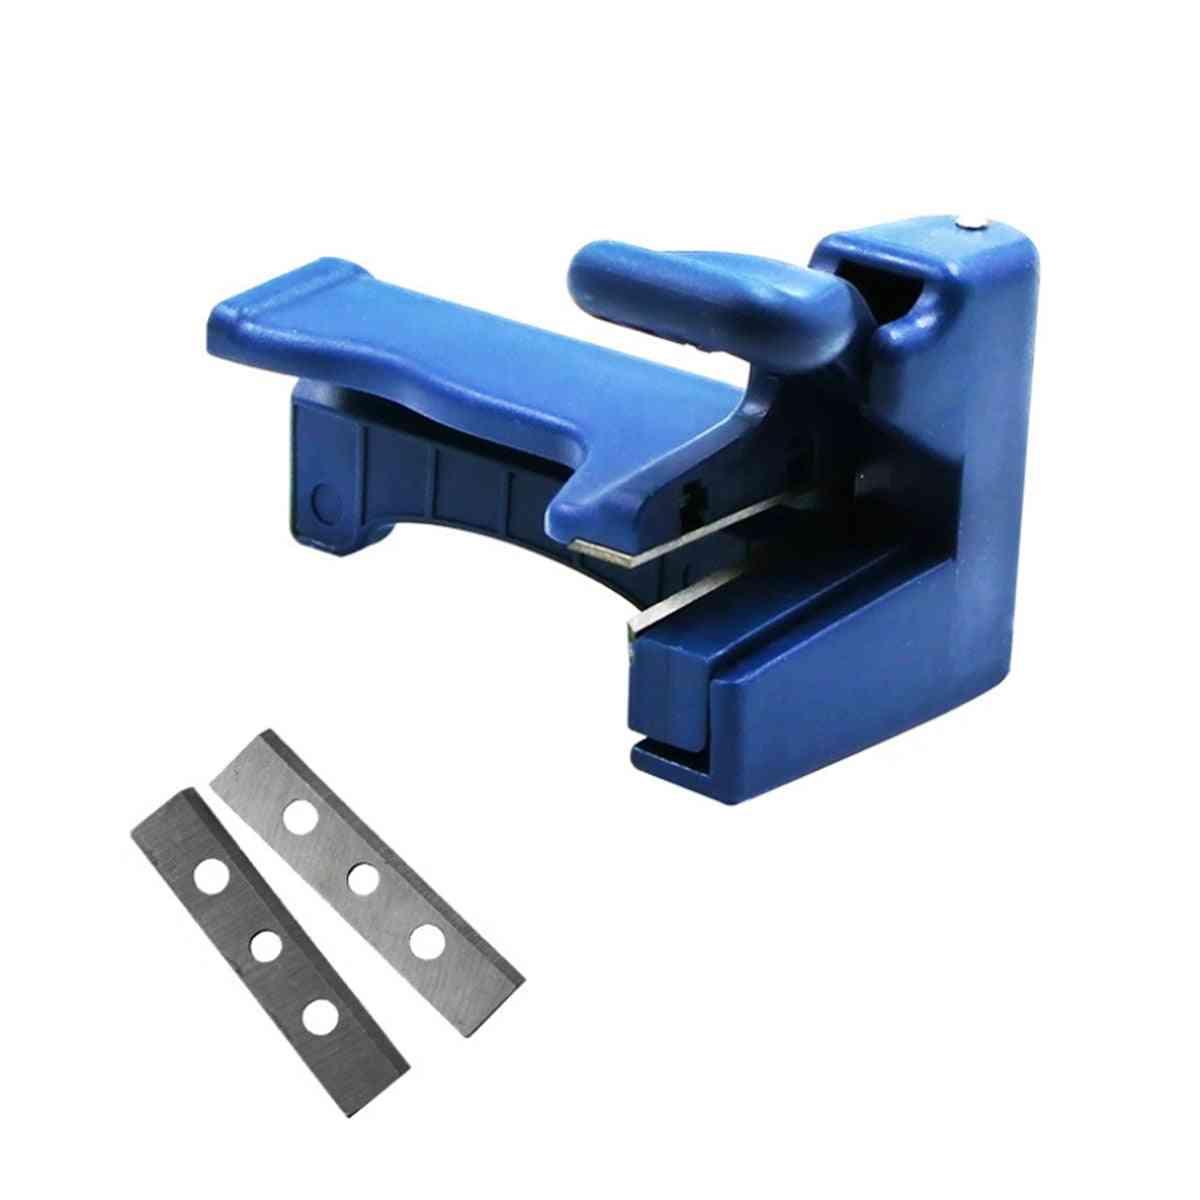 Trimmer Manual Edge Bending Cutter, Wood And Tail Carpenter Hardware Machine Set